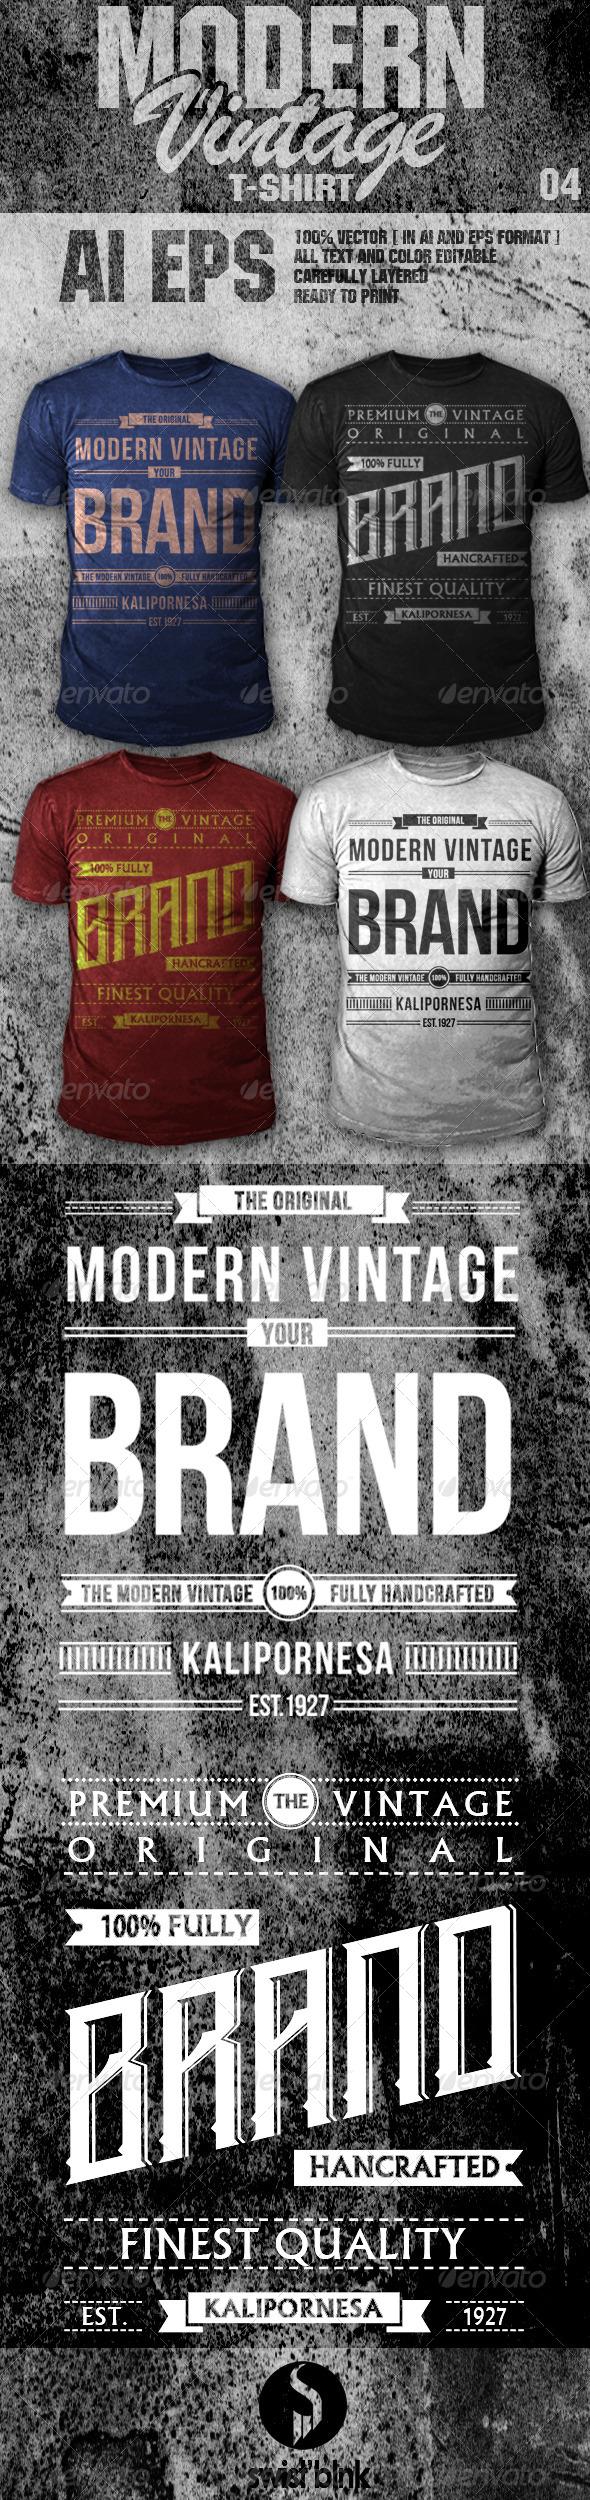 GraphicRiver Modern Vintage T-Shirt 04 6717309